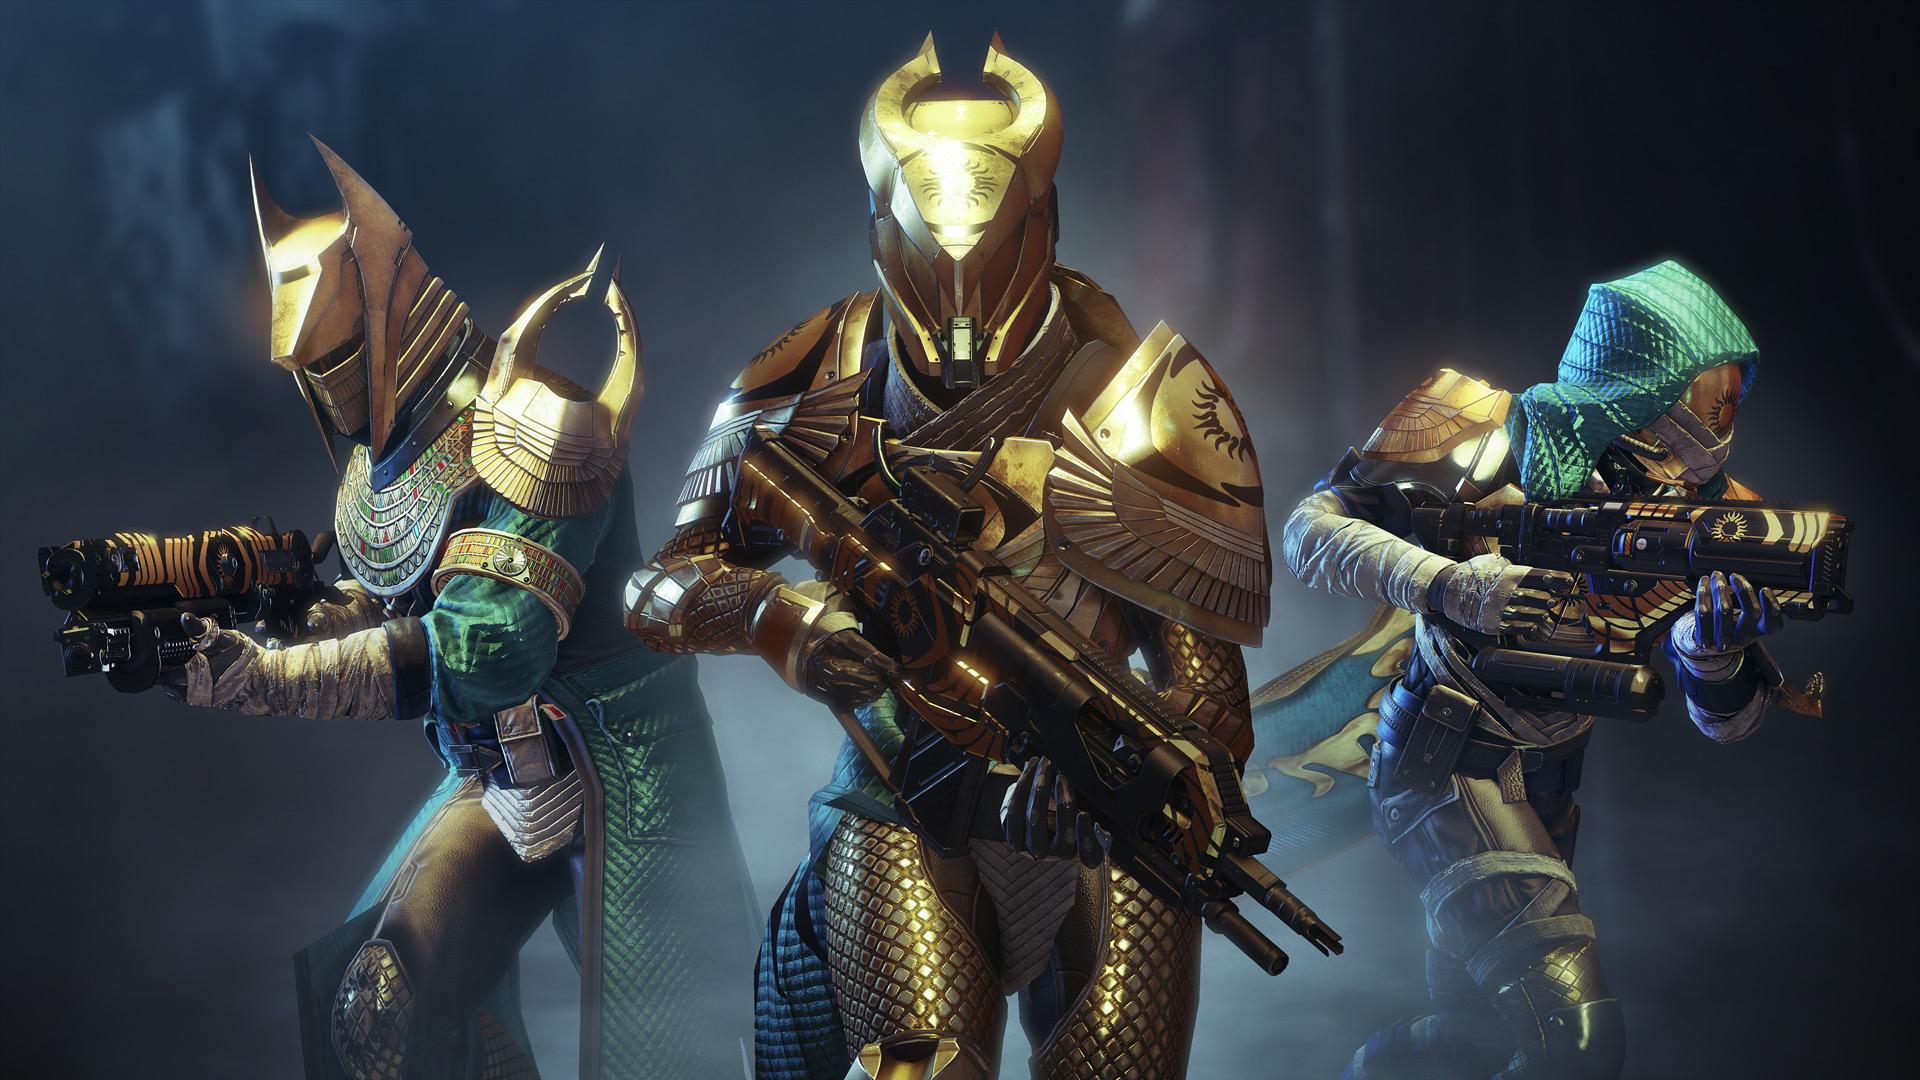 destiny 2 armor ornaments